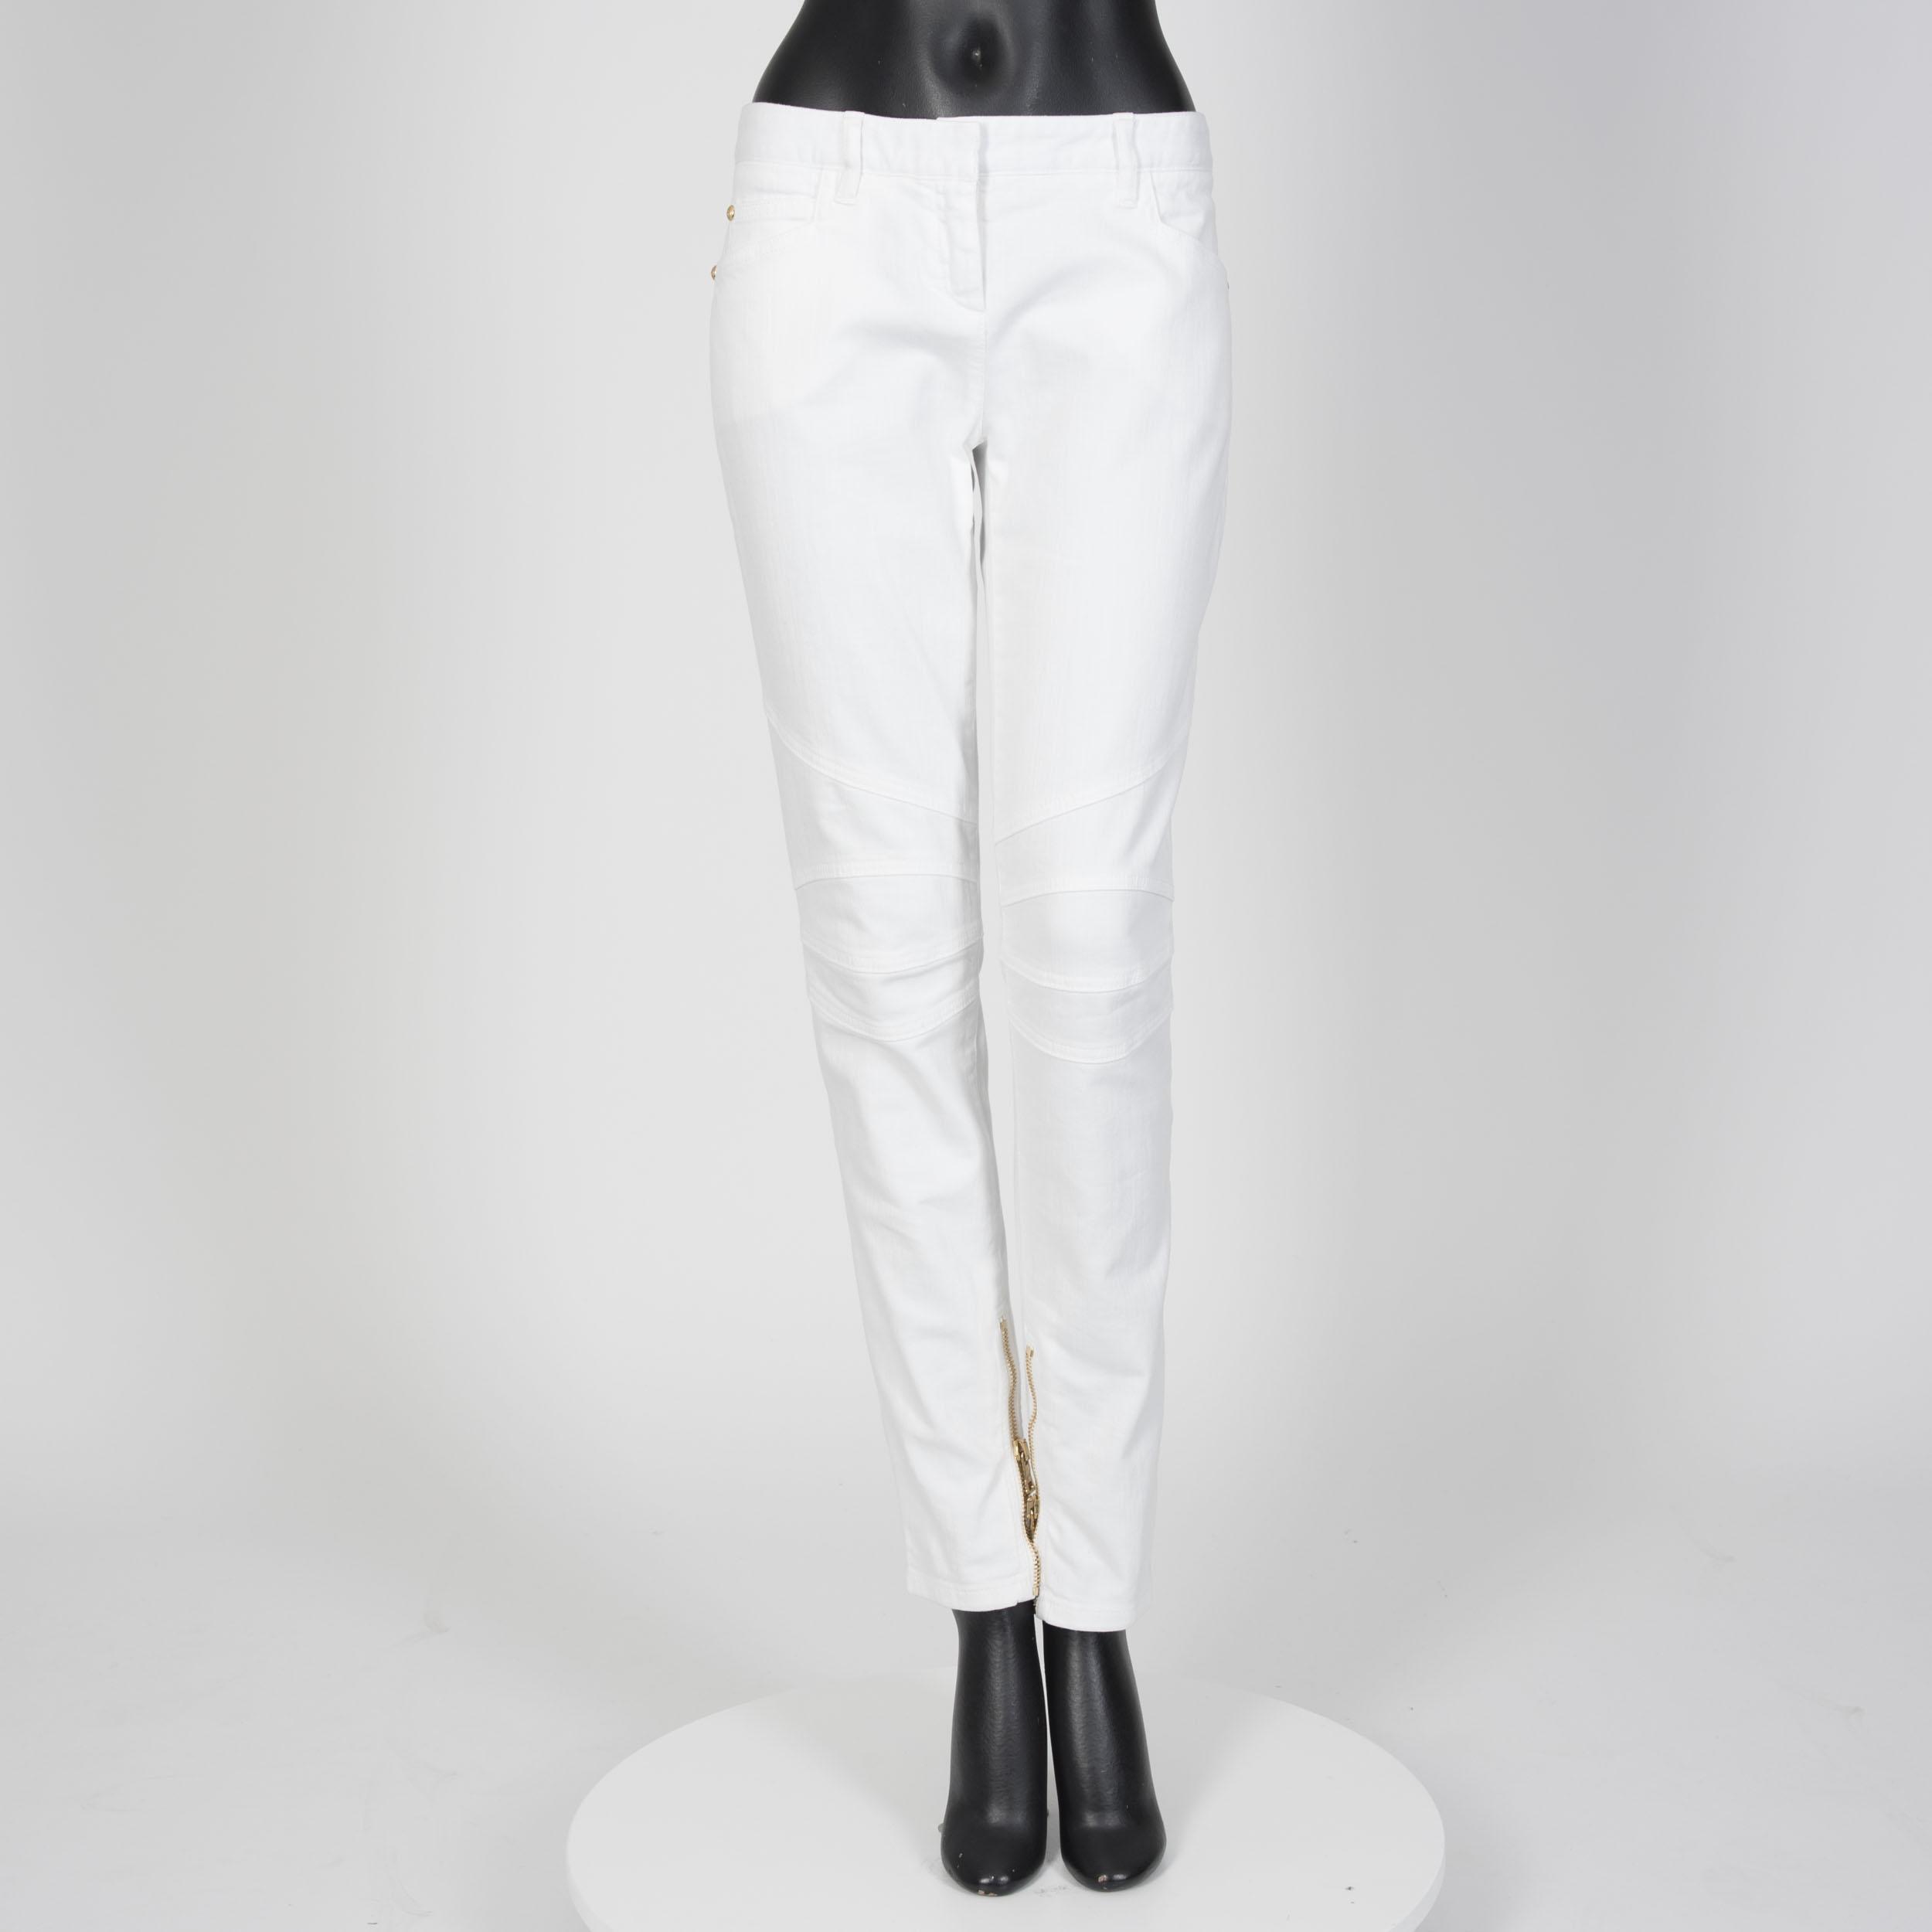 4d4e479f850 BALMAIN 990$ Authentic New White Cotton Mid Rise Skinny Biker Jeans ...